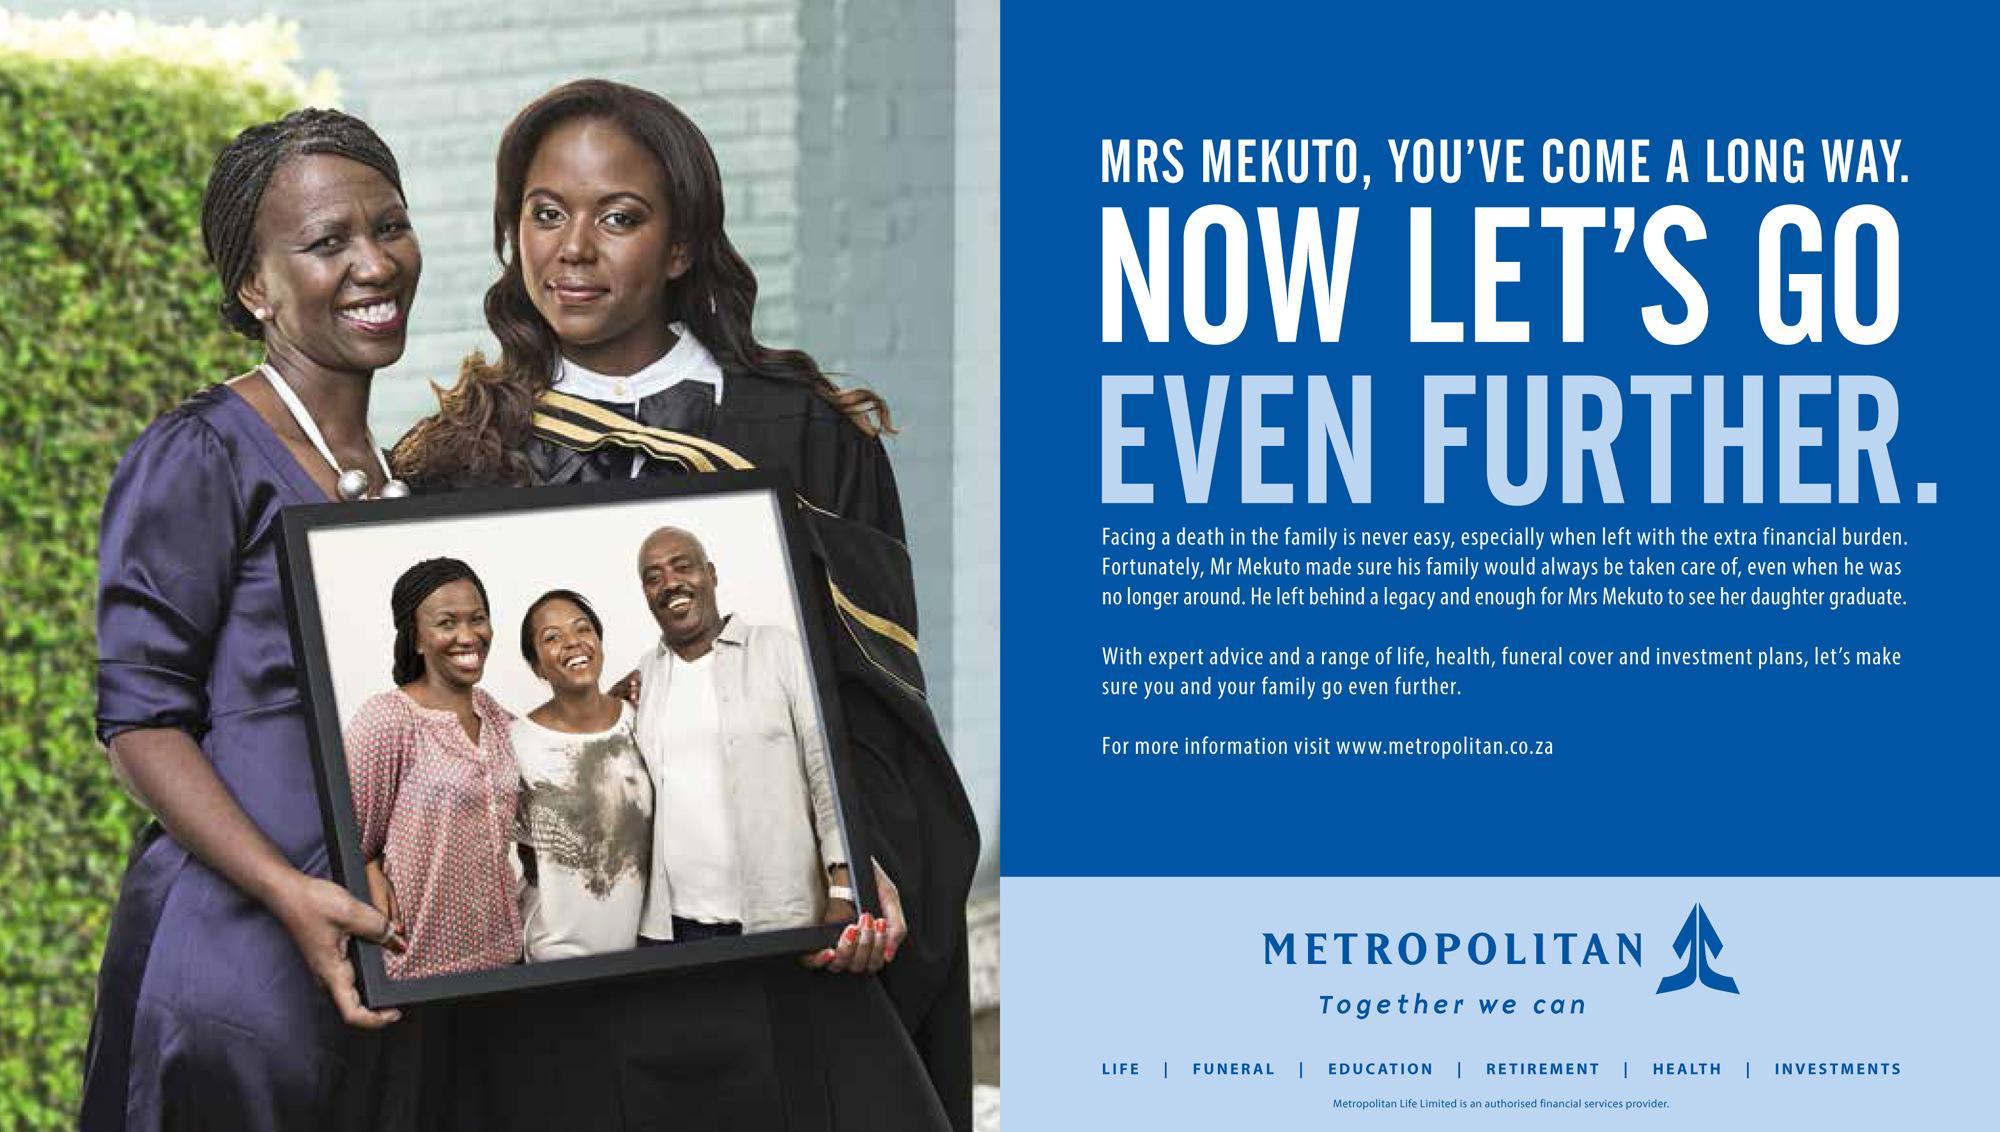 10Advertising 2. Metropolitan Insurance.jpg